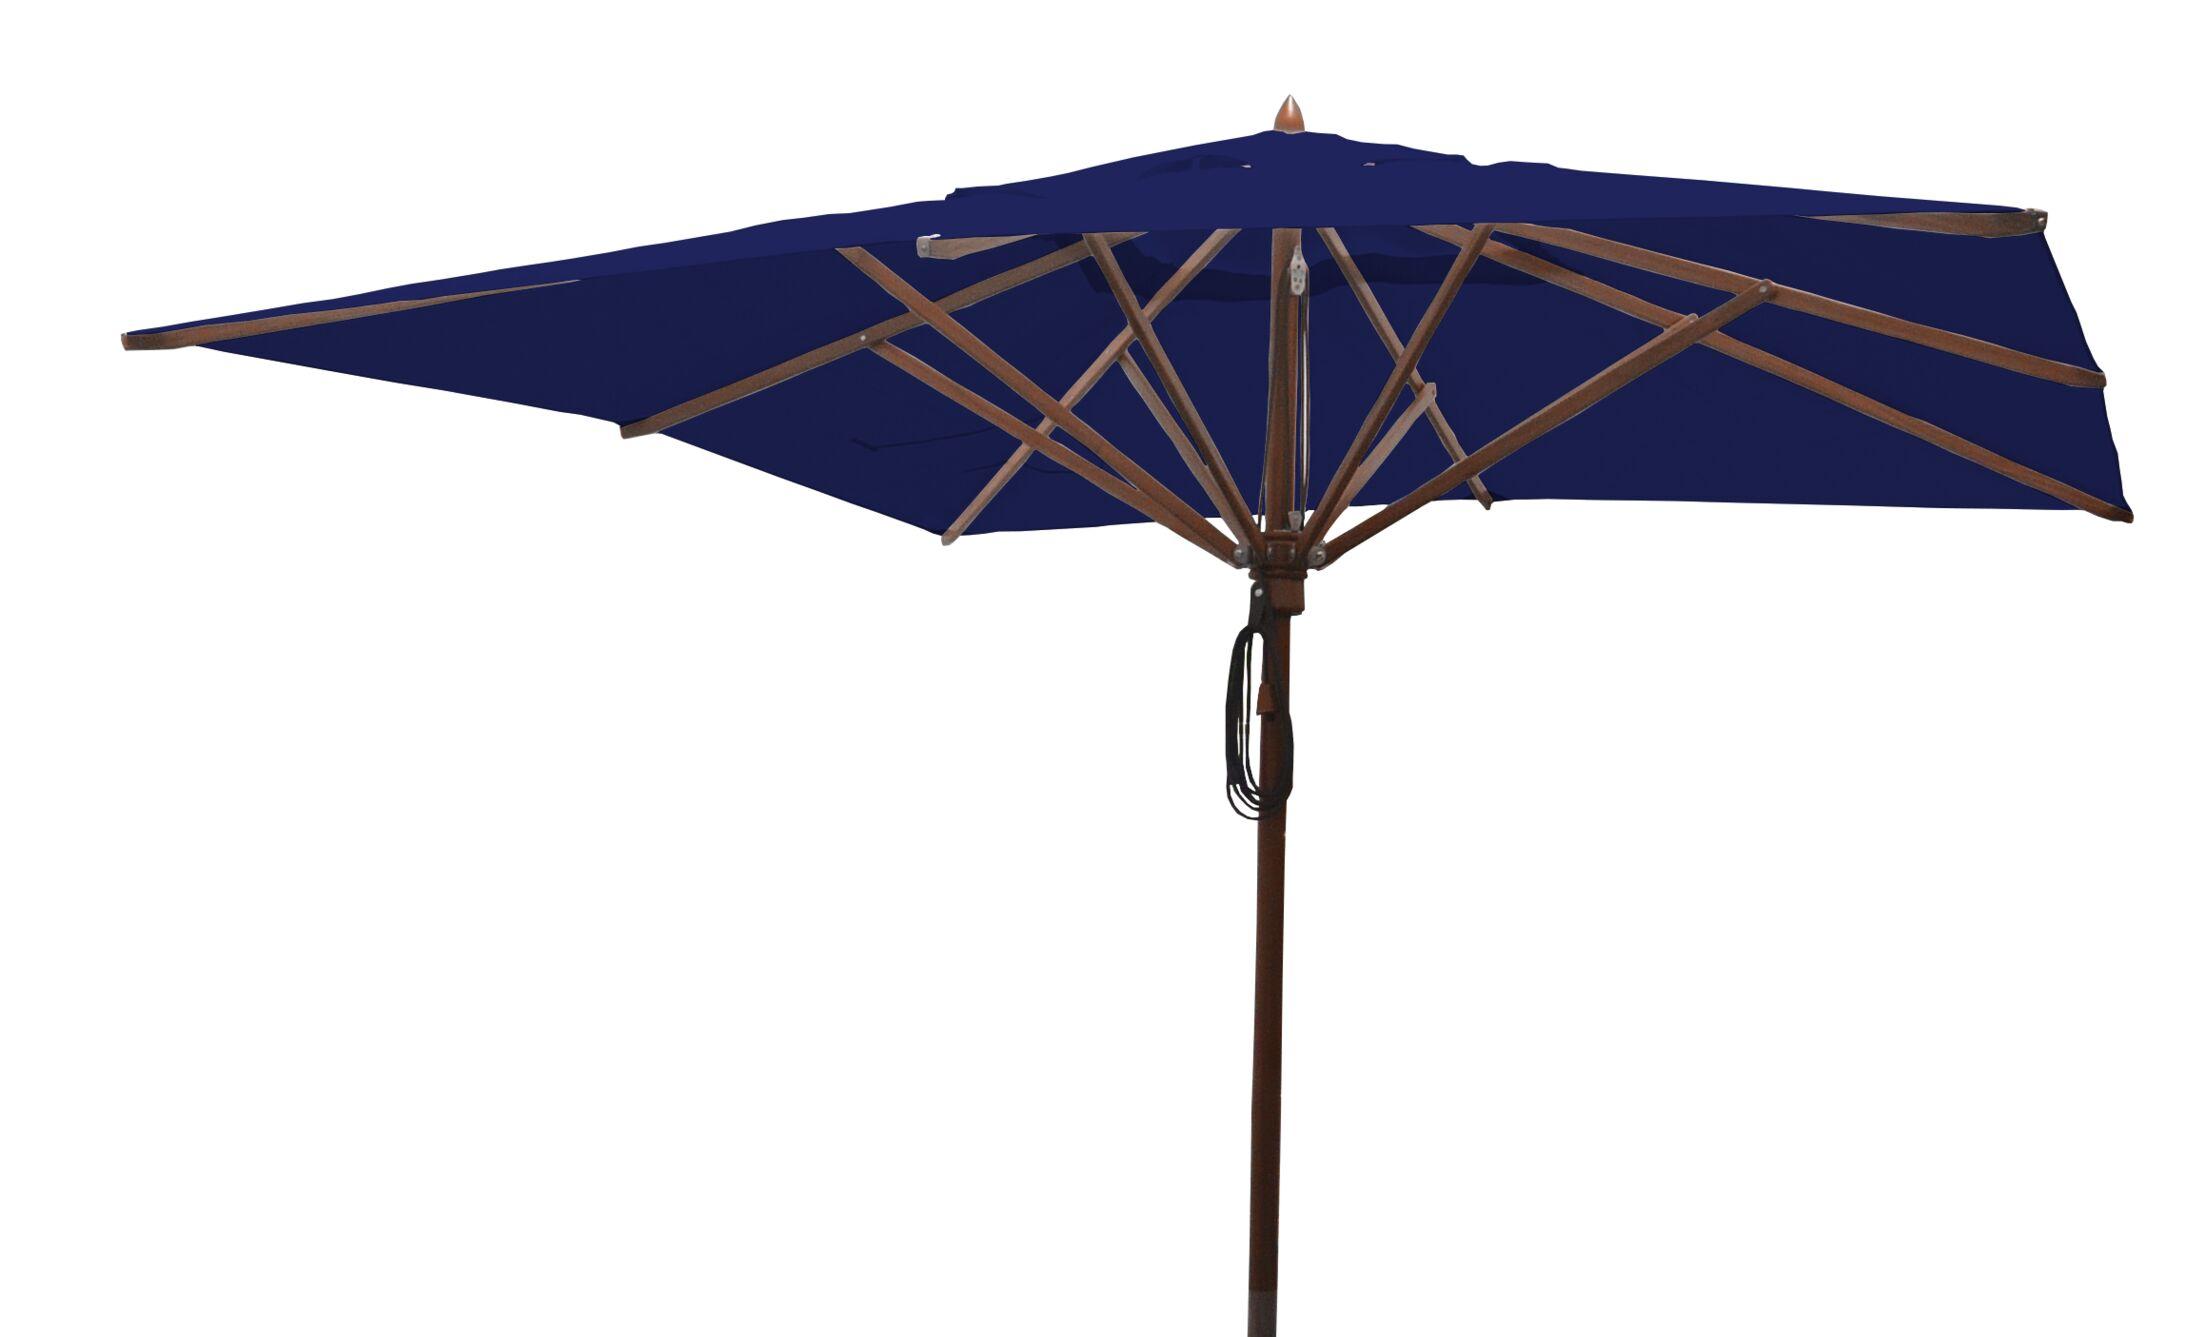 Sabanc 10' Square Market Umbrella Fabric: Ocean Blue